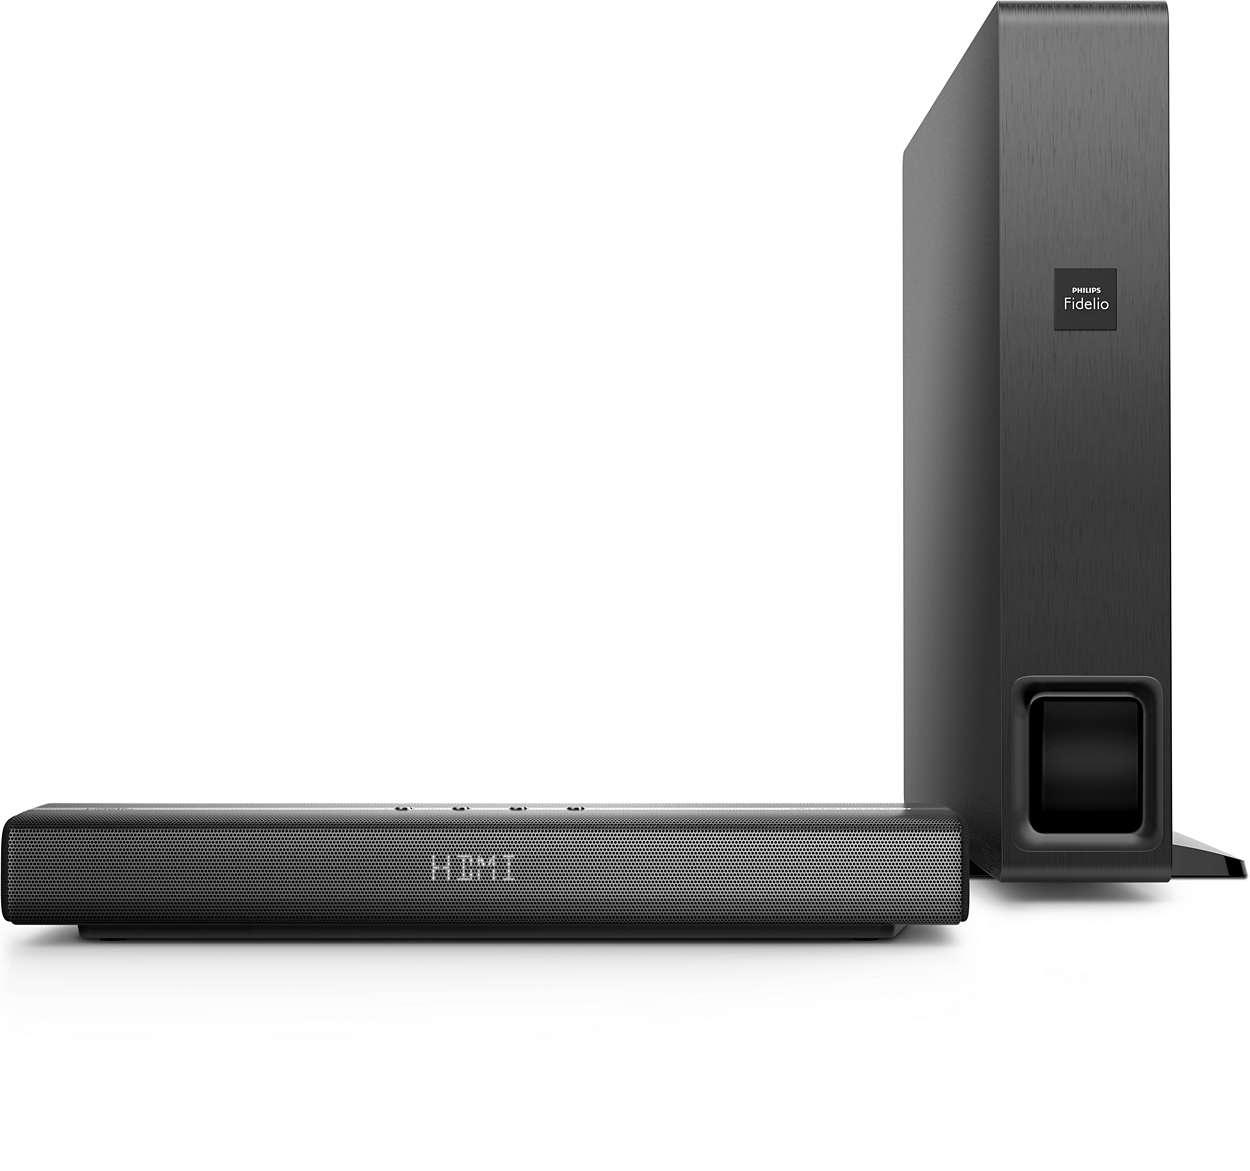 nano cinema speaker b1 12 fidelio. Black Bedroom Furniture Sets. Home Design Ideas